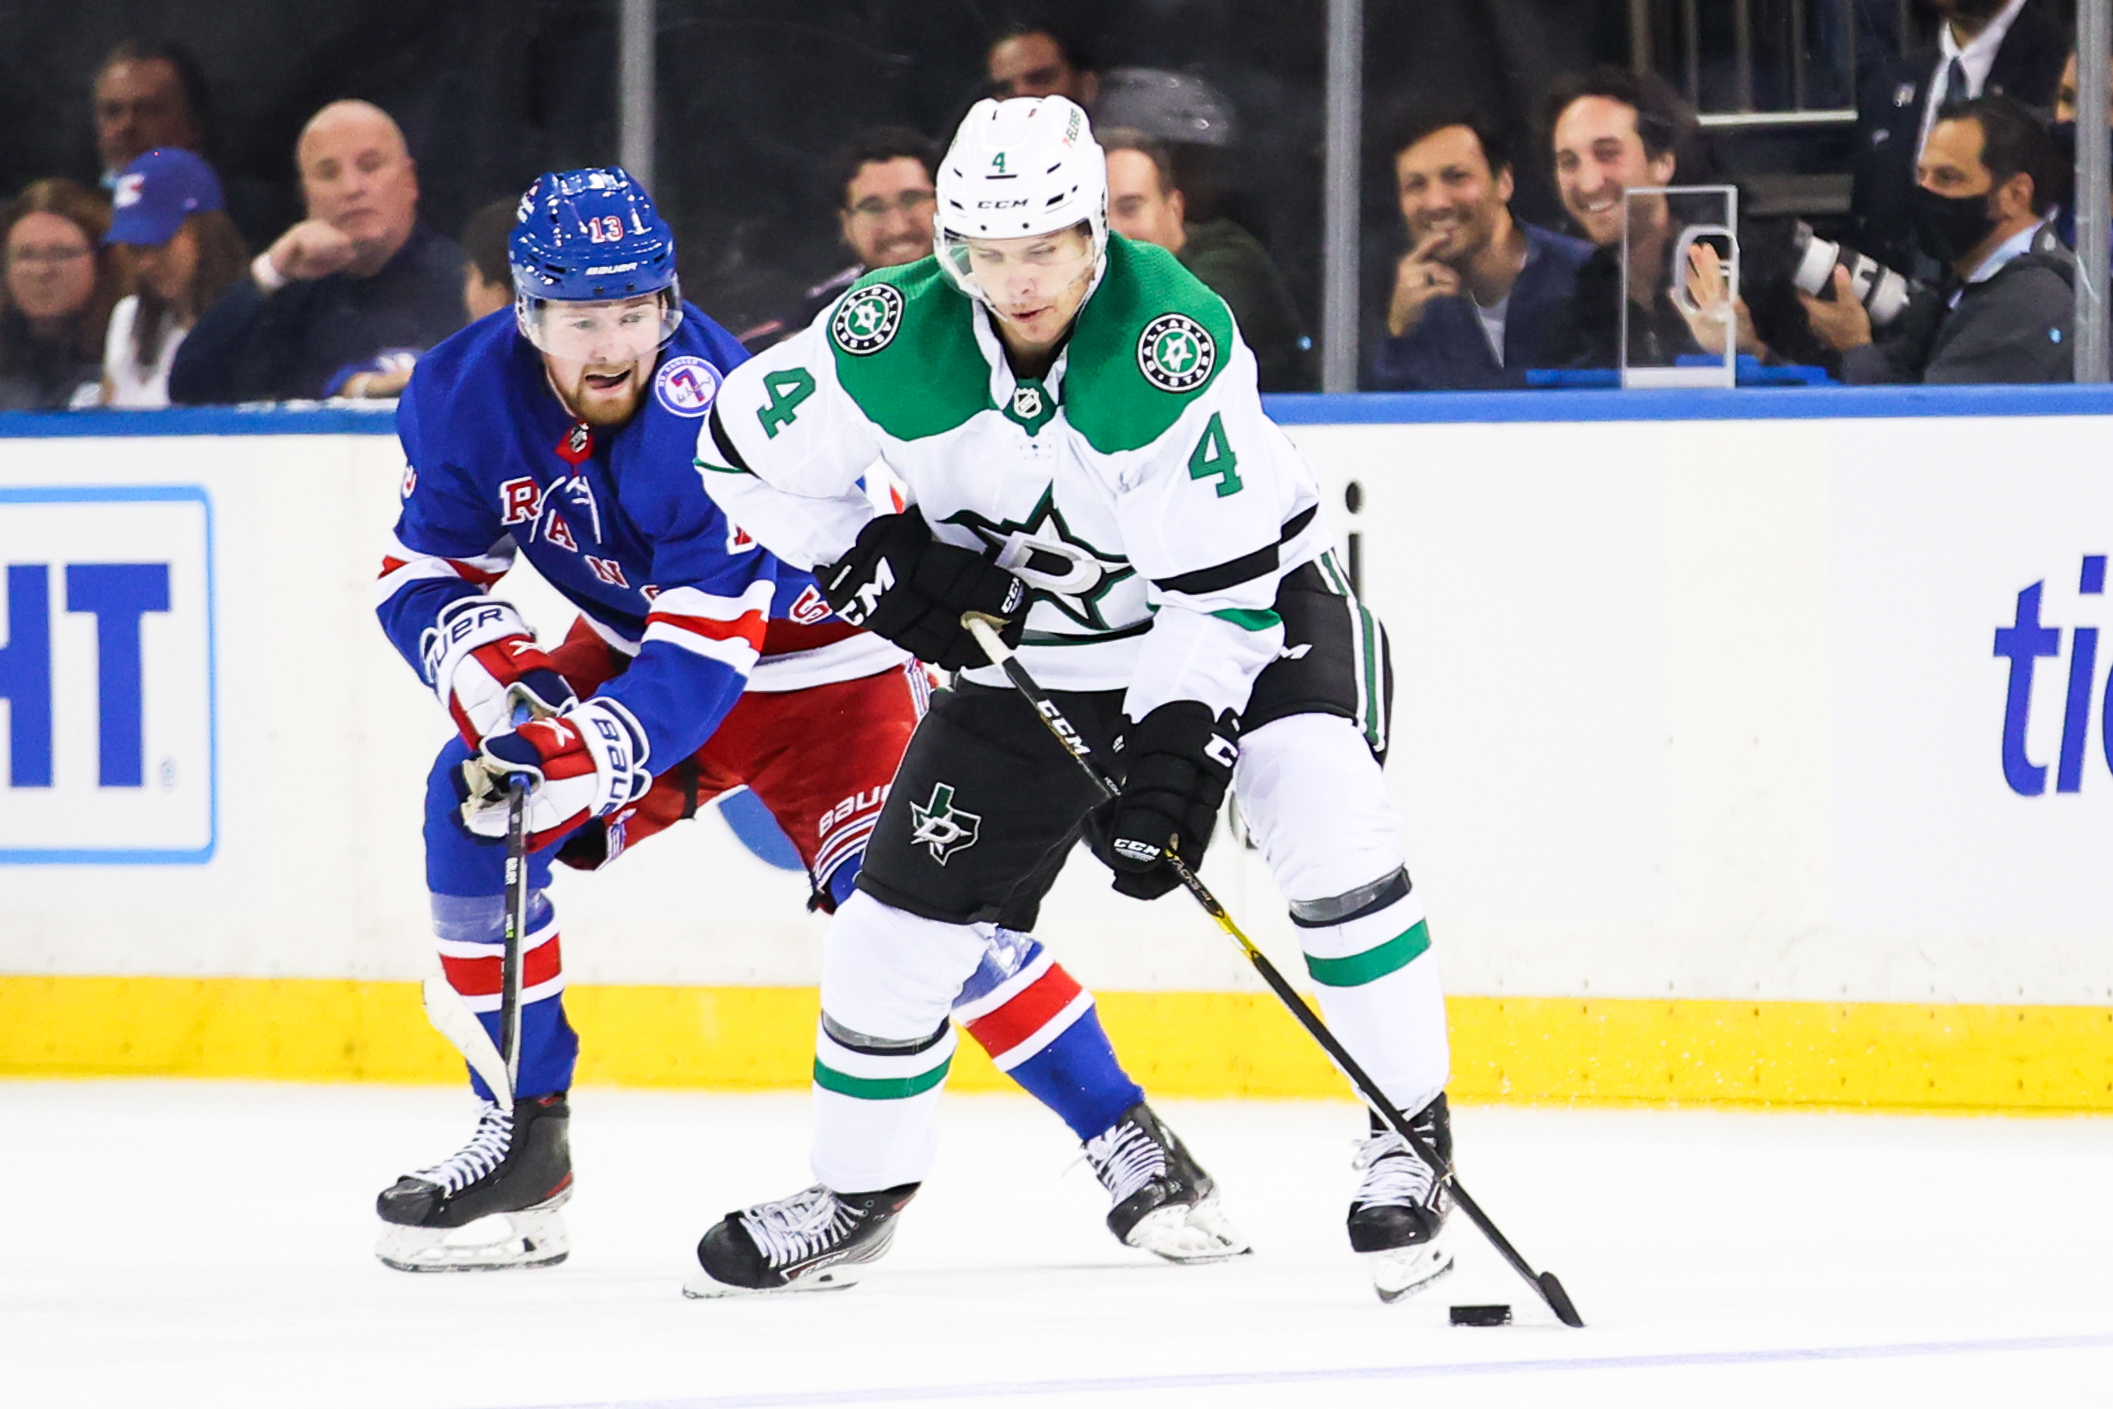 NHL: OCT 14 Stars at Rangers